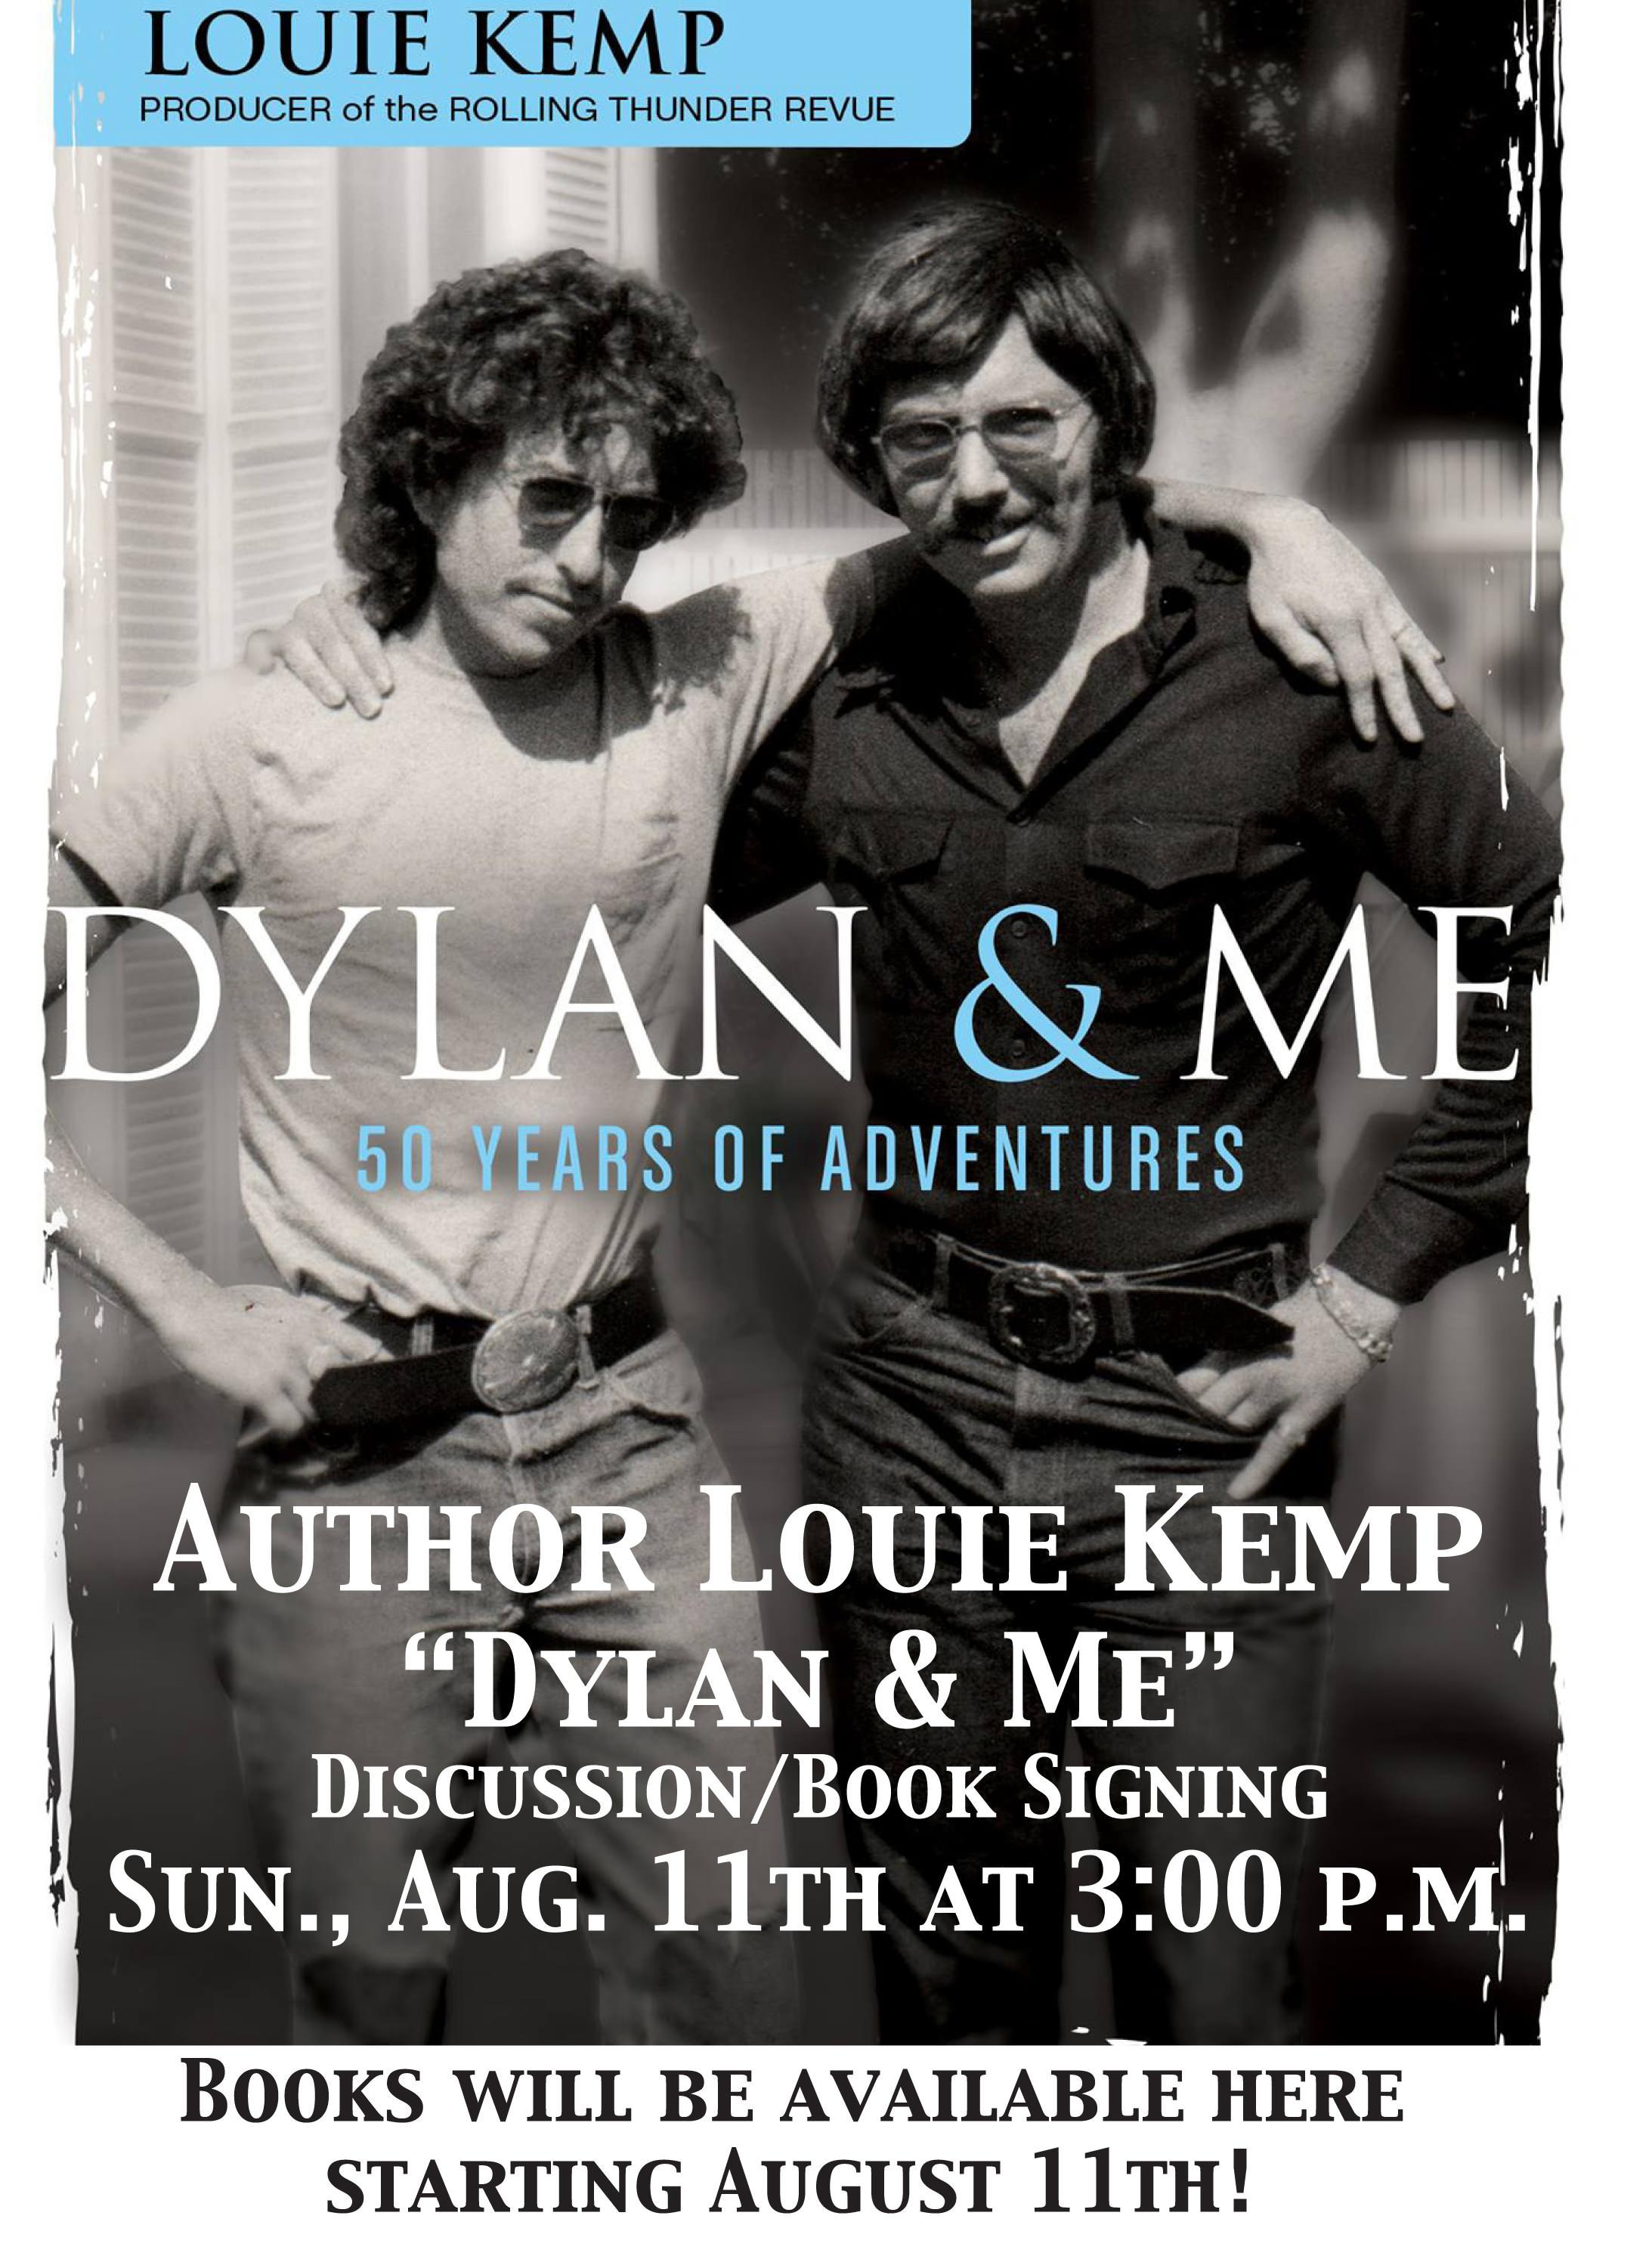 LOUIE KEMP - DYLAN & ME - ELECTRIC FETUS.jpg